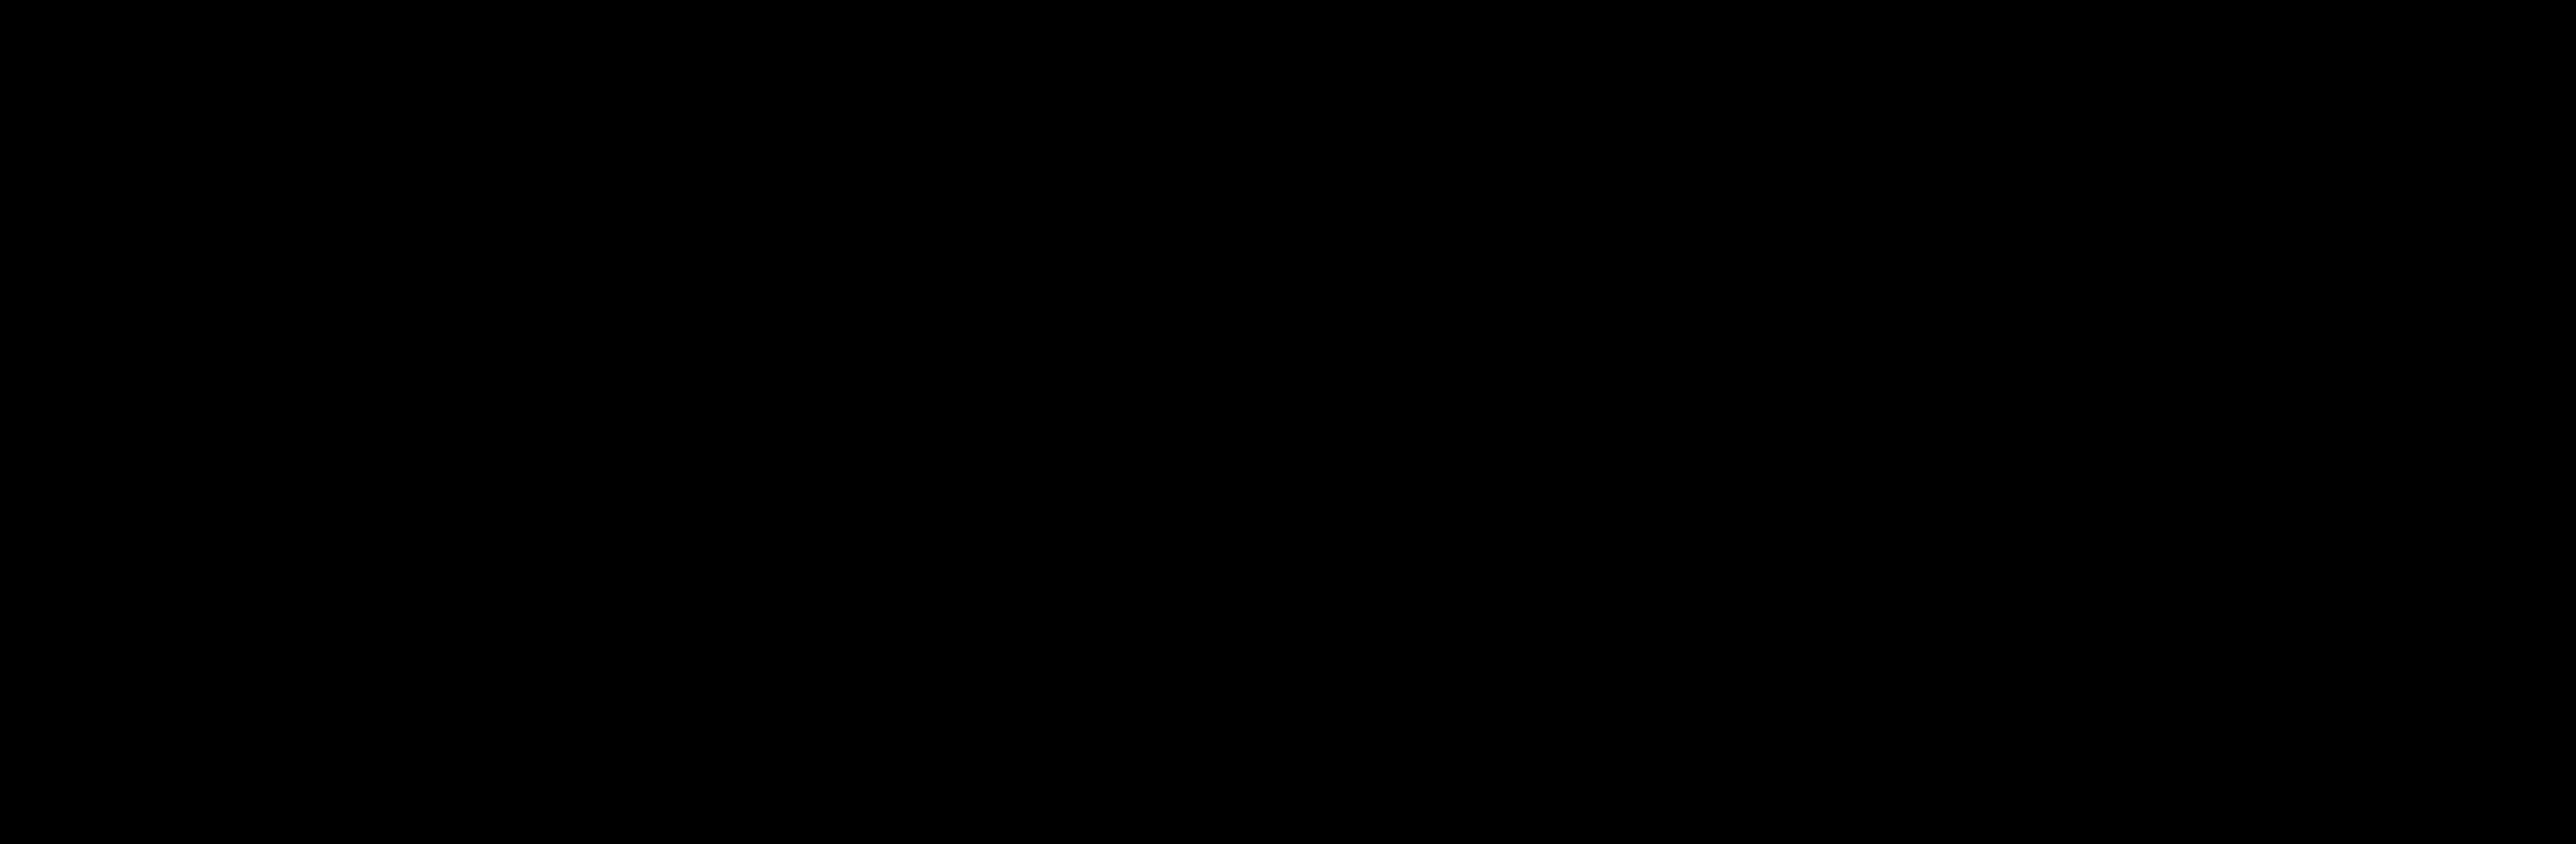 Acetyl-CoA - Wikipedia